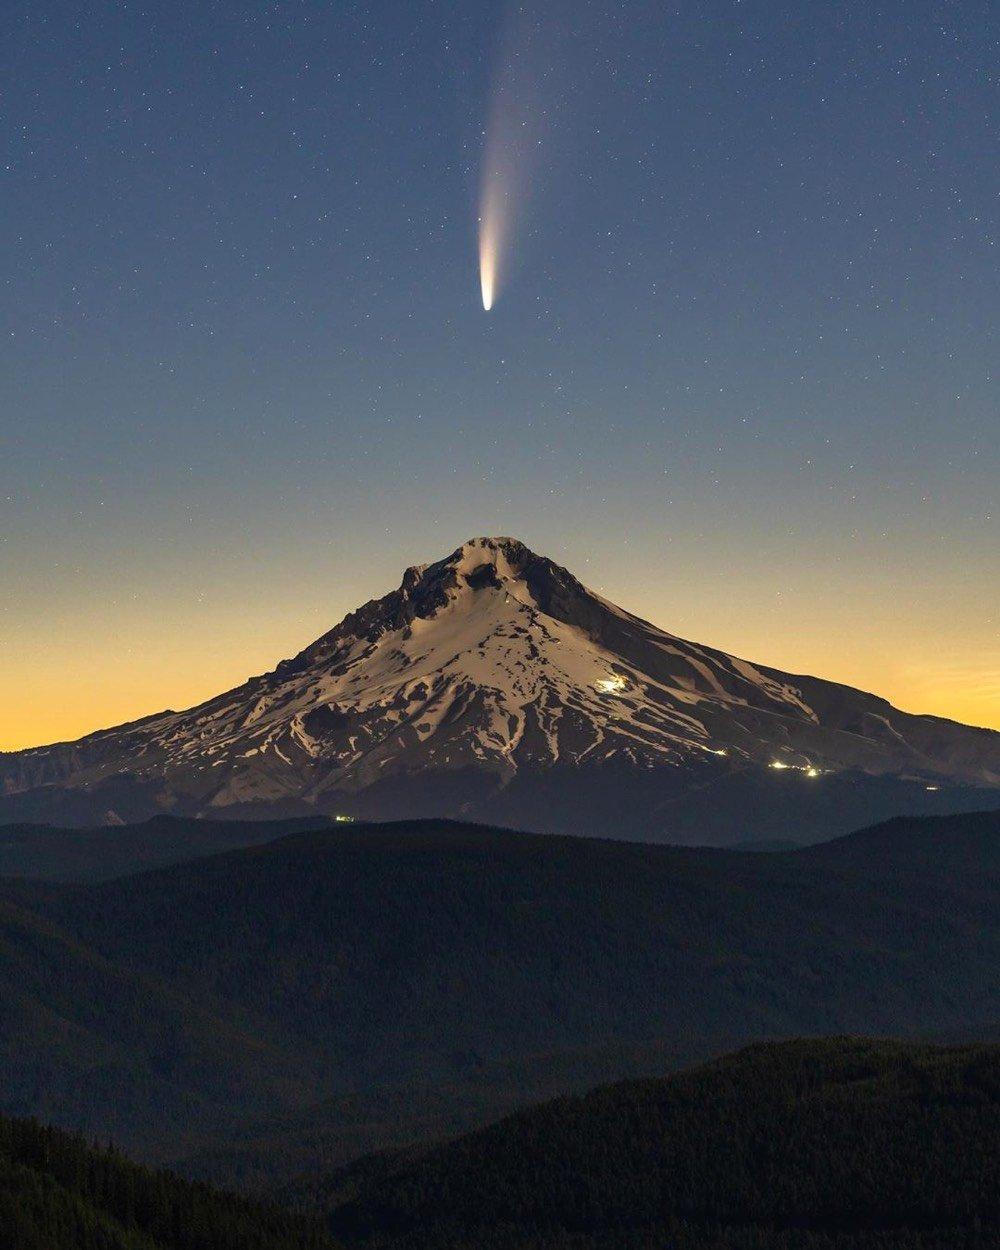 comet neowise 03 تصاویر خیره کننده از رصد دنبالهدار نئووایز اخبار IT